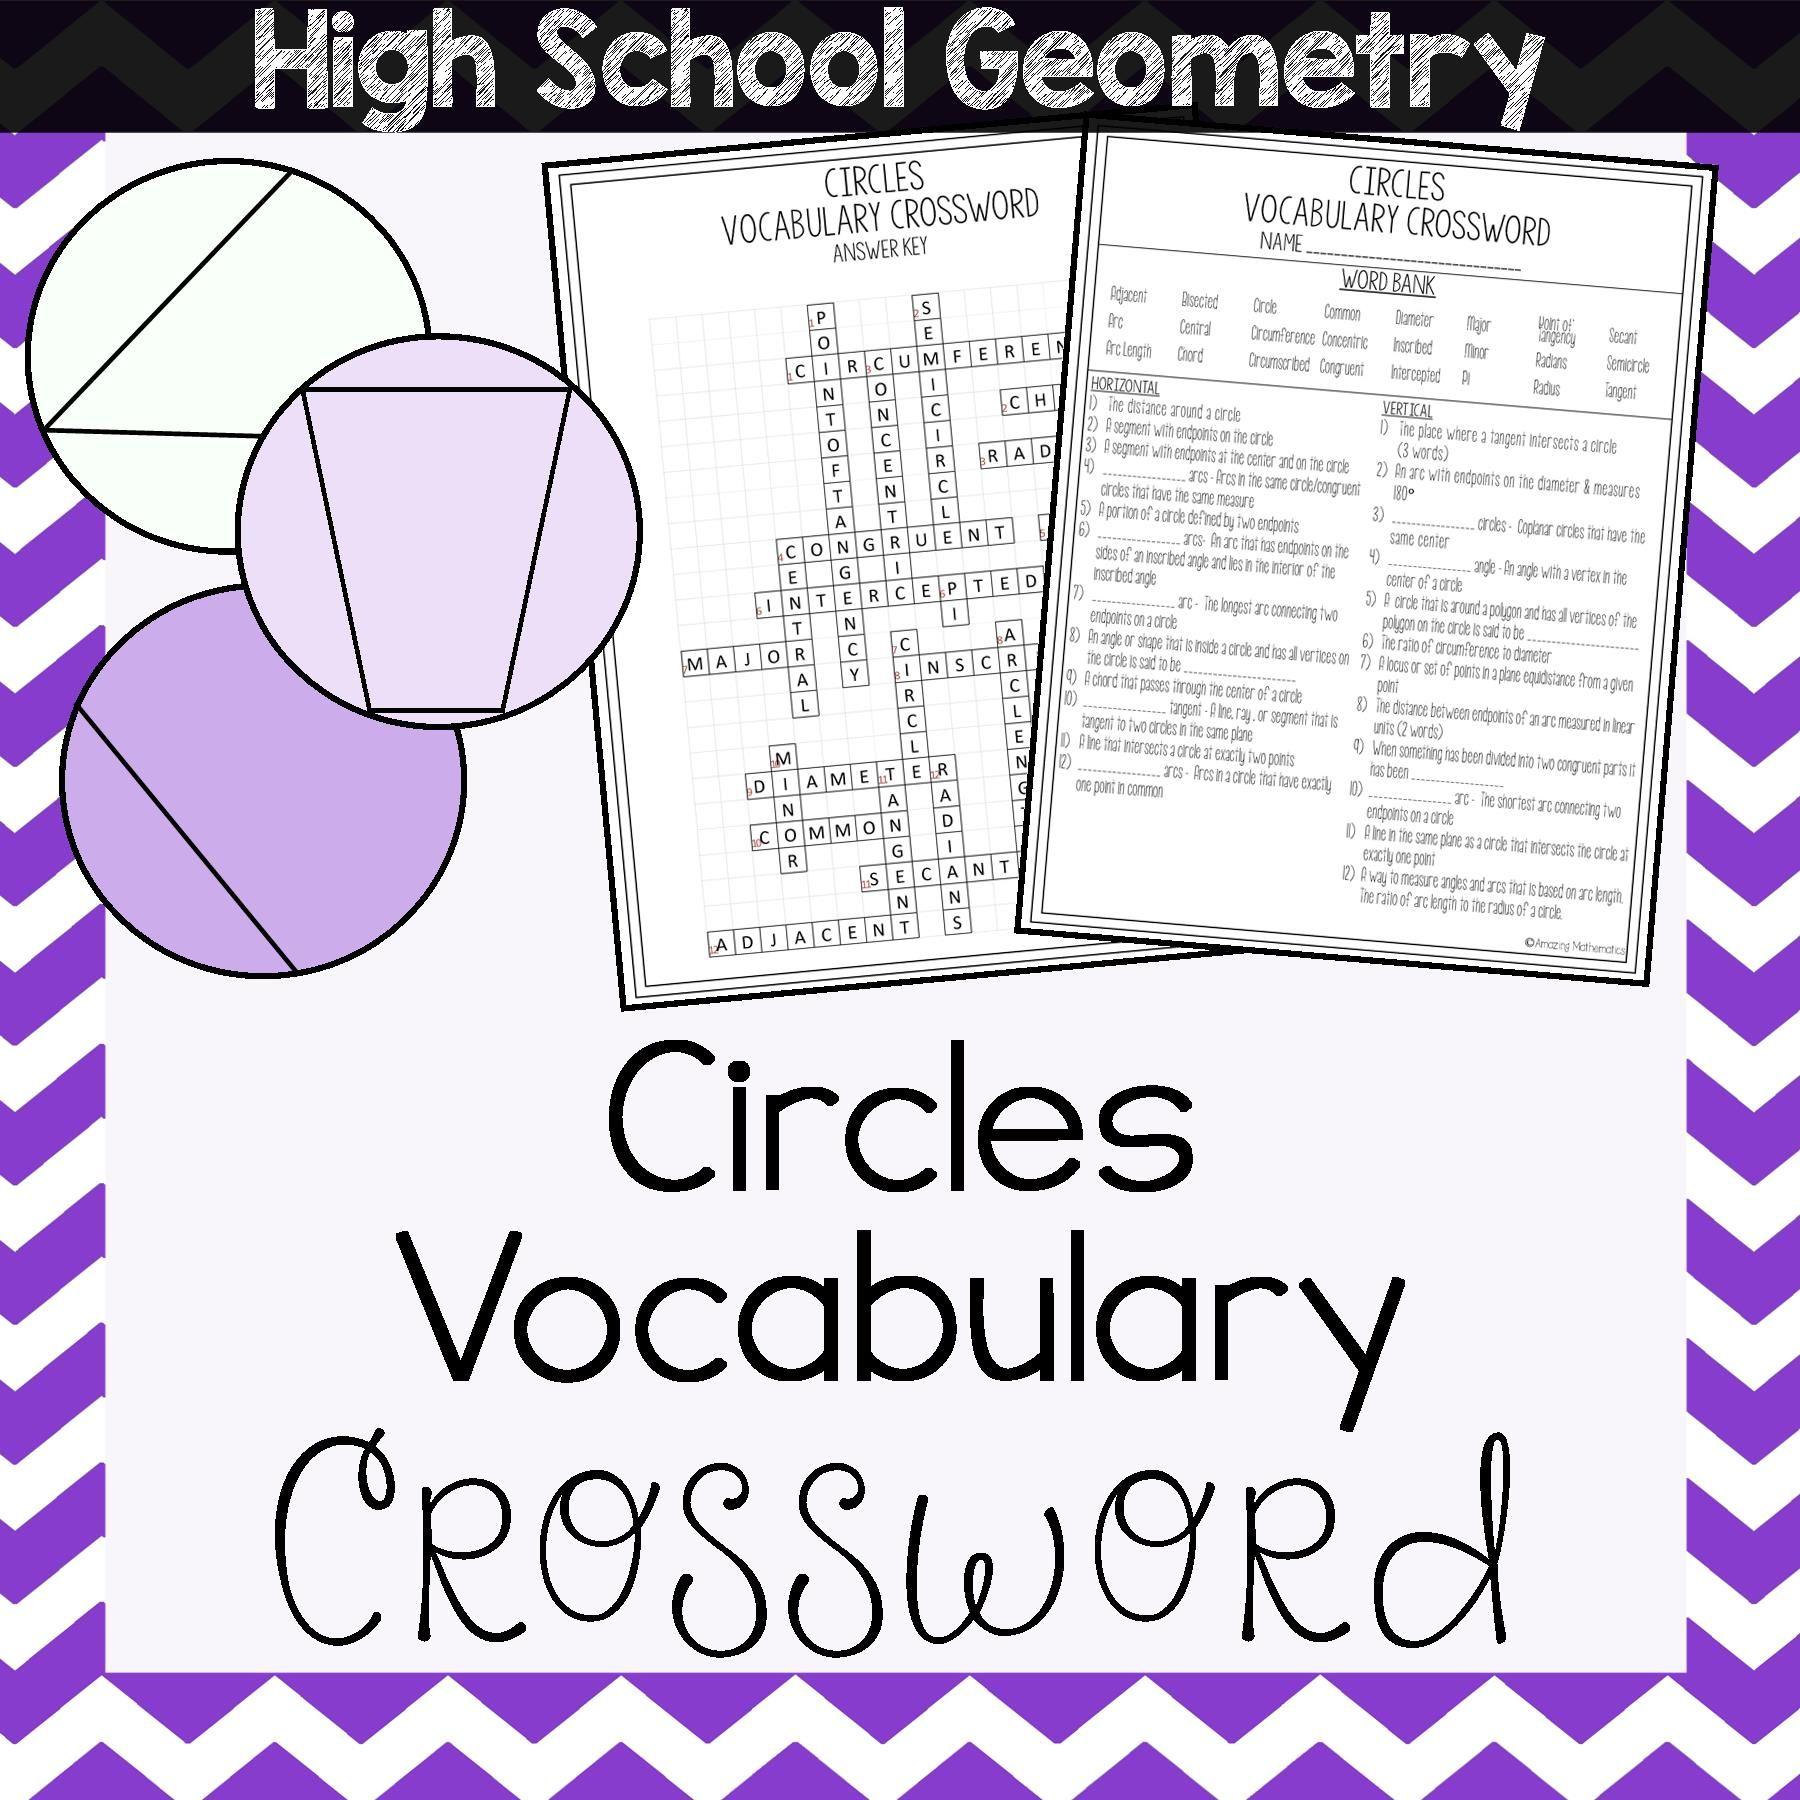 Circles Vocabulary Crossword